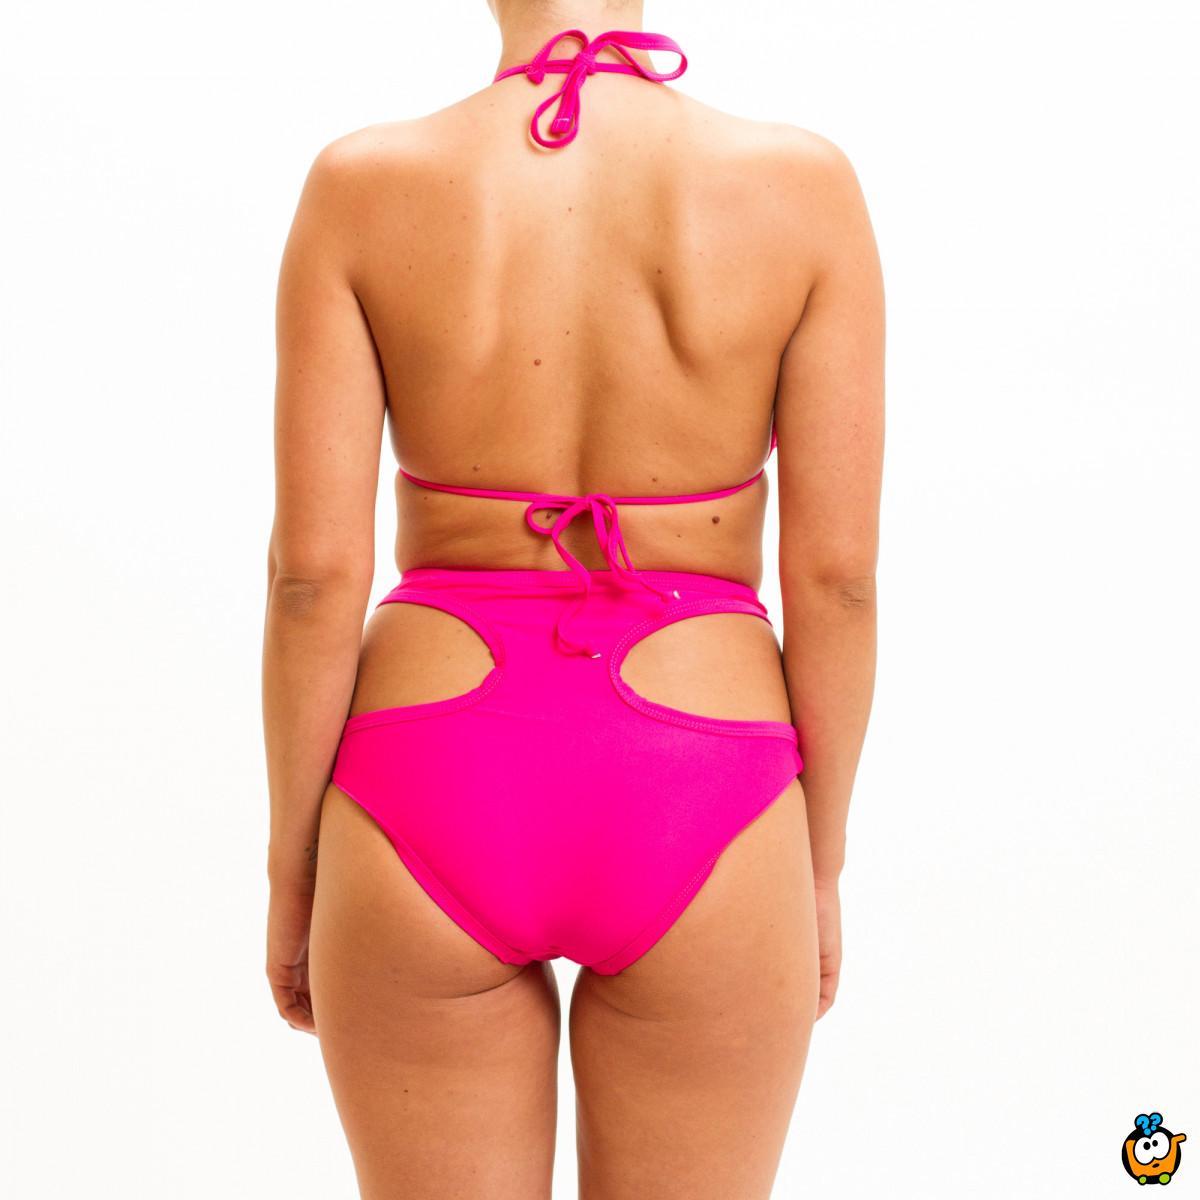 Dvodelni ženski kupaći kostim - LA SEXY PINK